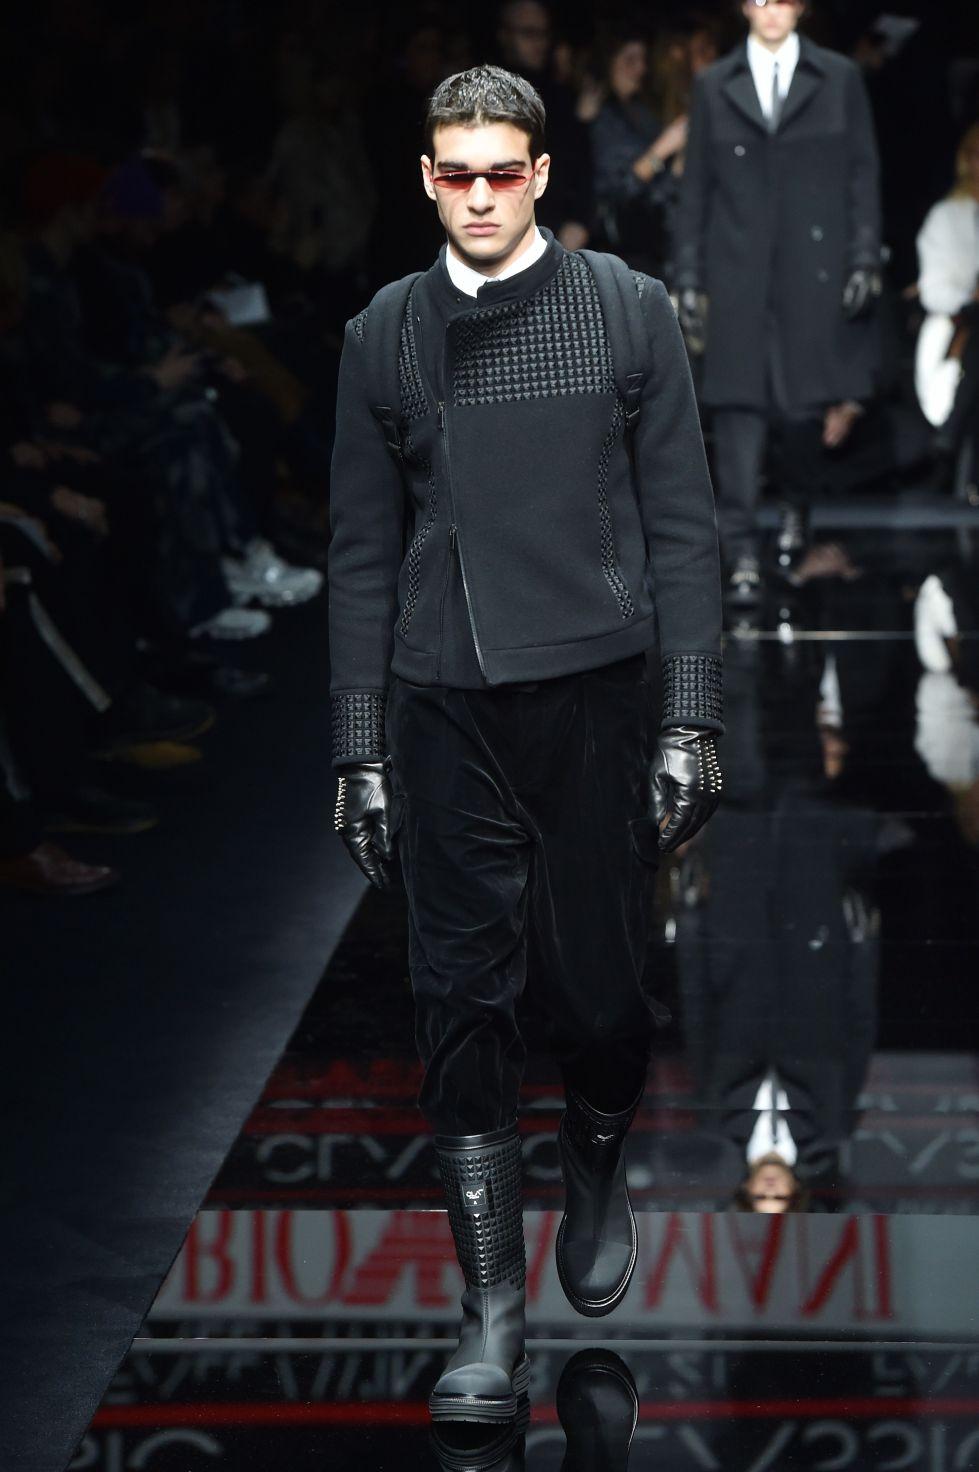 pantaloni uomo autunno inverno 2020 2021 -  armani (2)